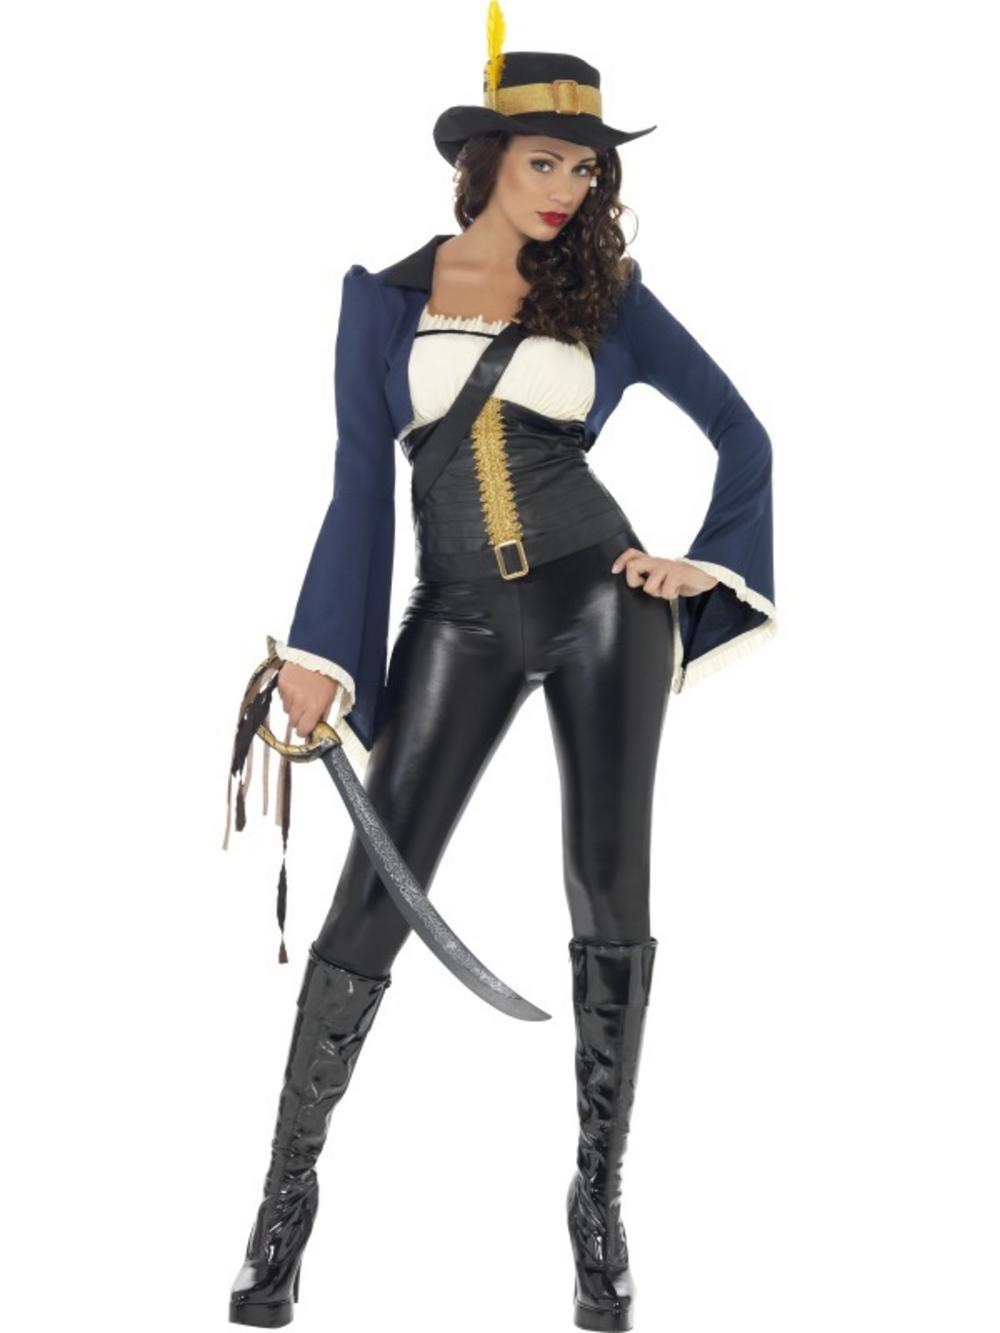 Angelica pirate costume congratulate, remarkable